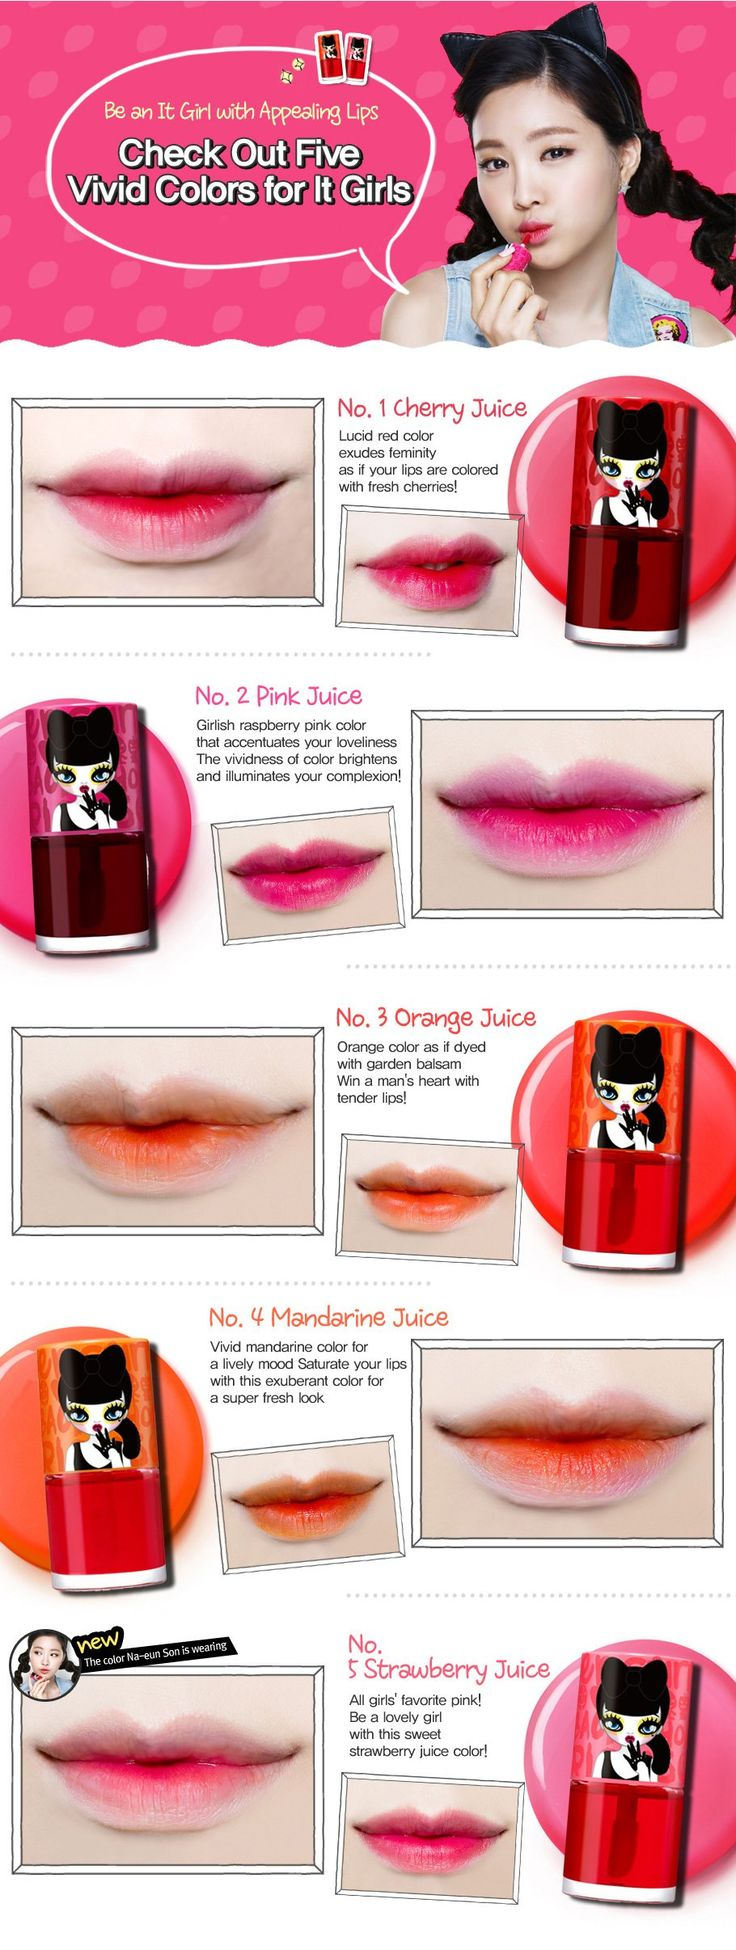 Peripera Peri's Tint Water Lip Balm, Strawberry Juice, 0.27 Ounce